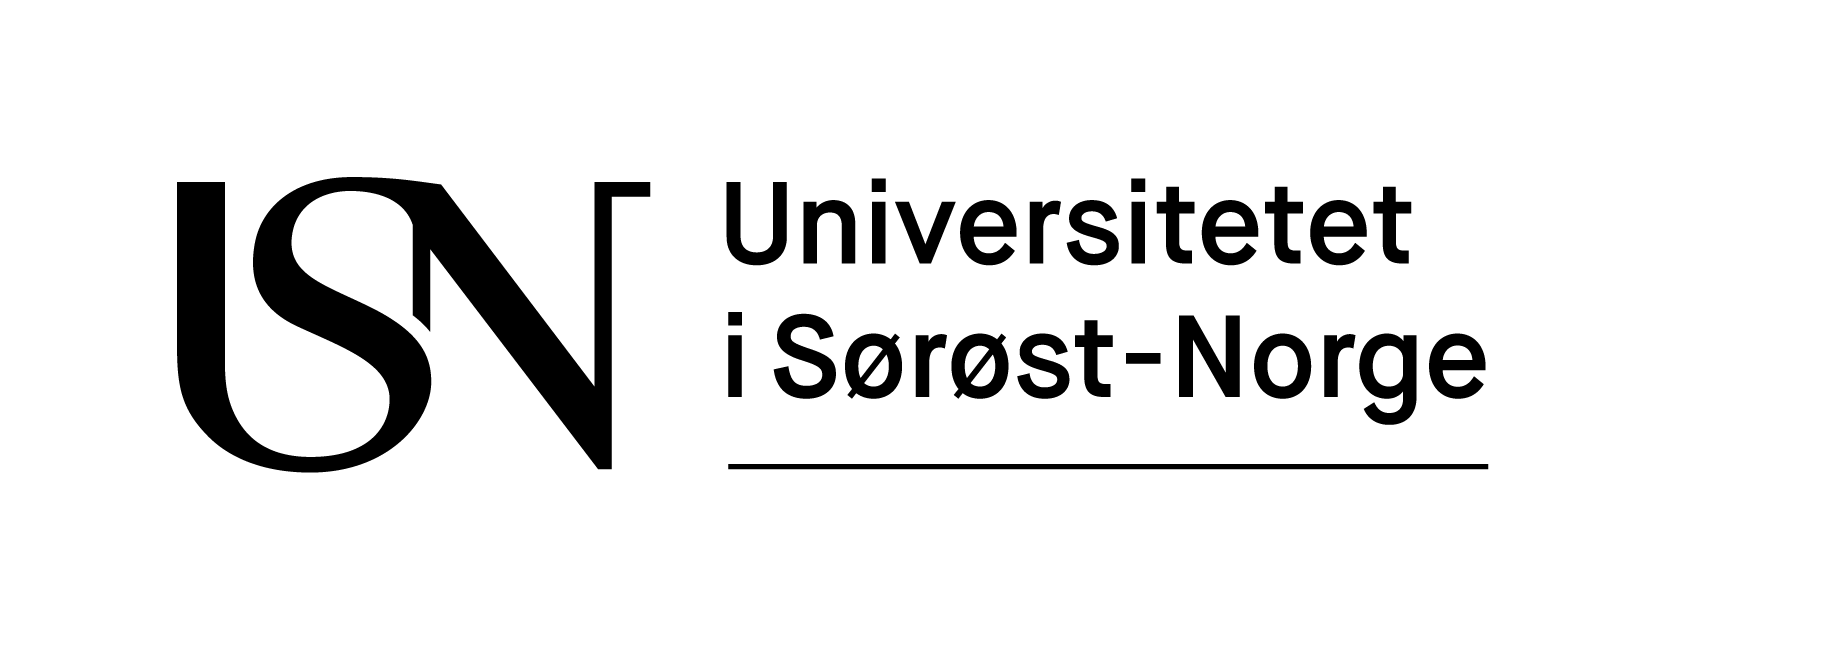 https://industriuka.no/wp-content/uploads/2021/10/USN_logo_rgb.png